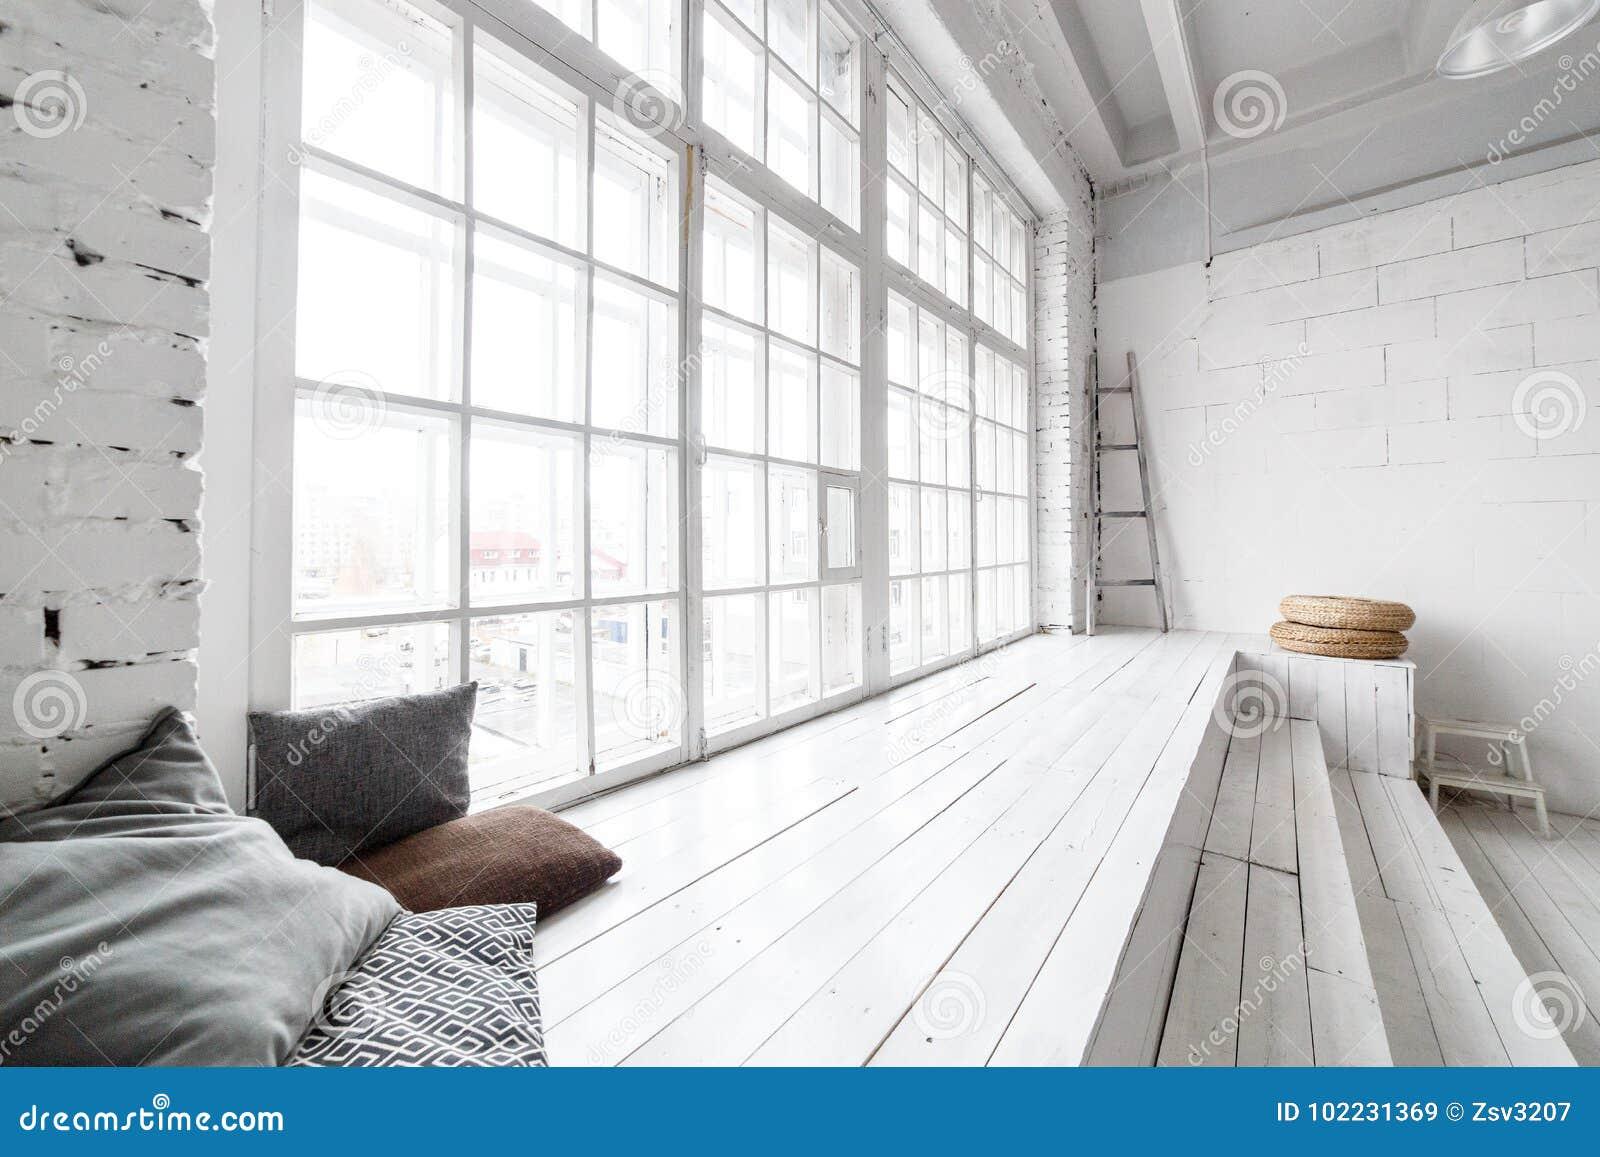 Heller Fotostudioinnenraum mit großem Fenster, hohe Decke, weißer Bretterboden